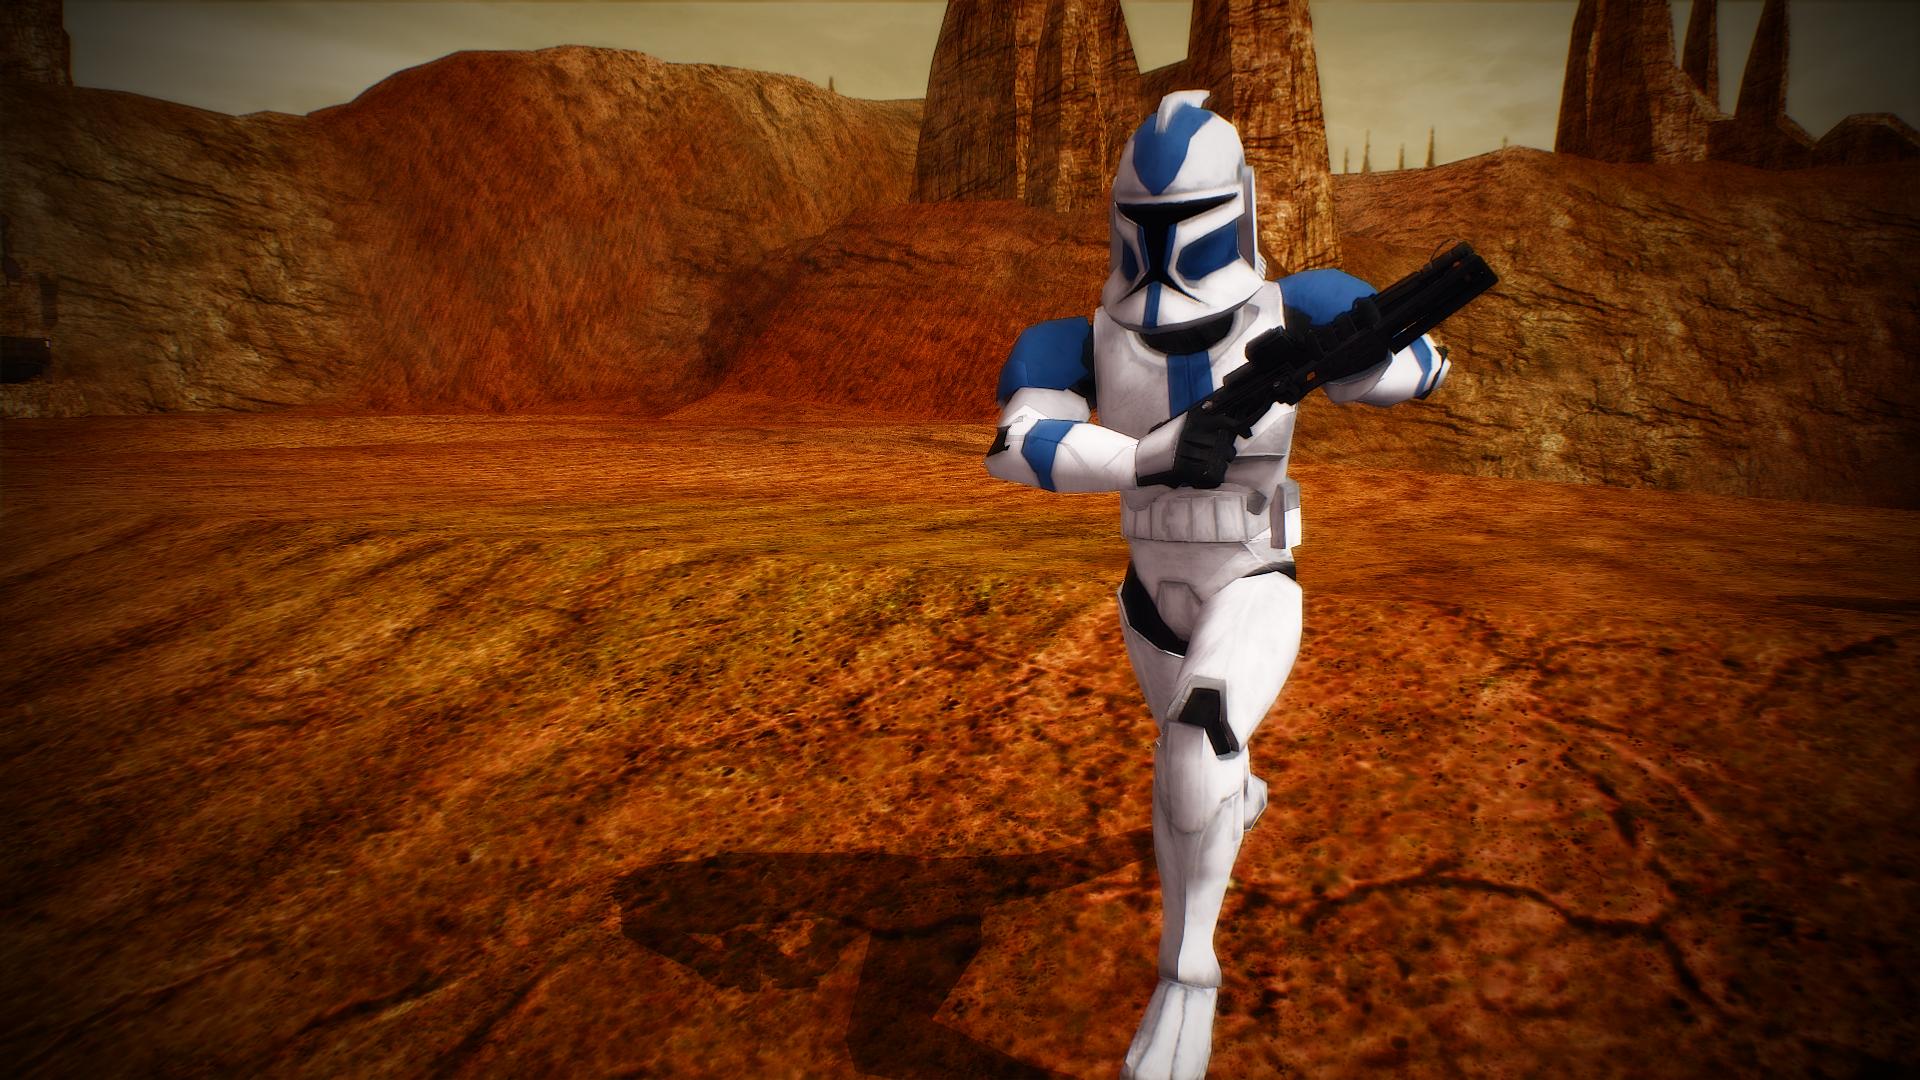 501st Clone Trooper Phase 1 Image Gongasleet Era Mod For Star Wars Battlefront Ii Mod Db